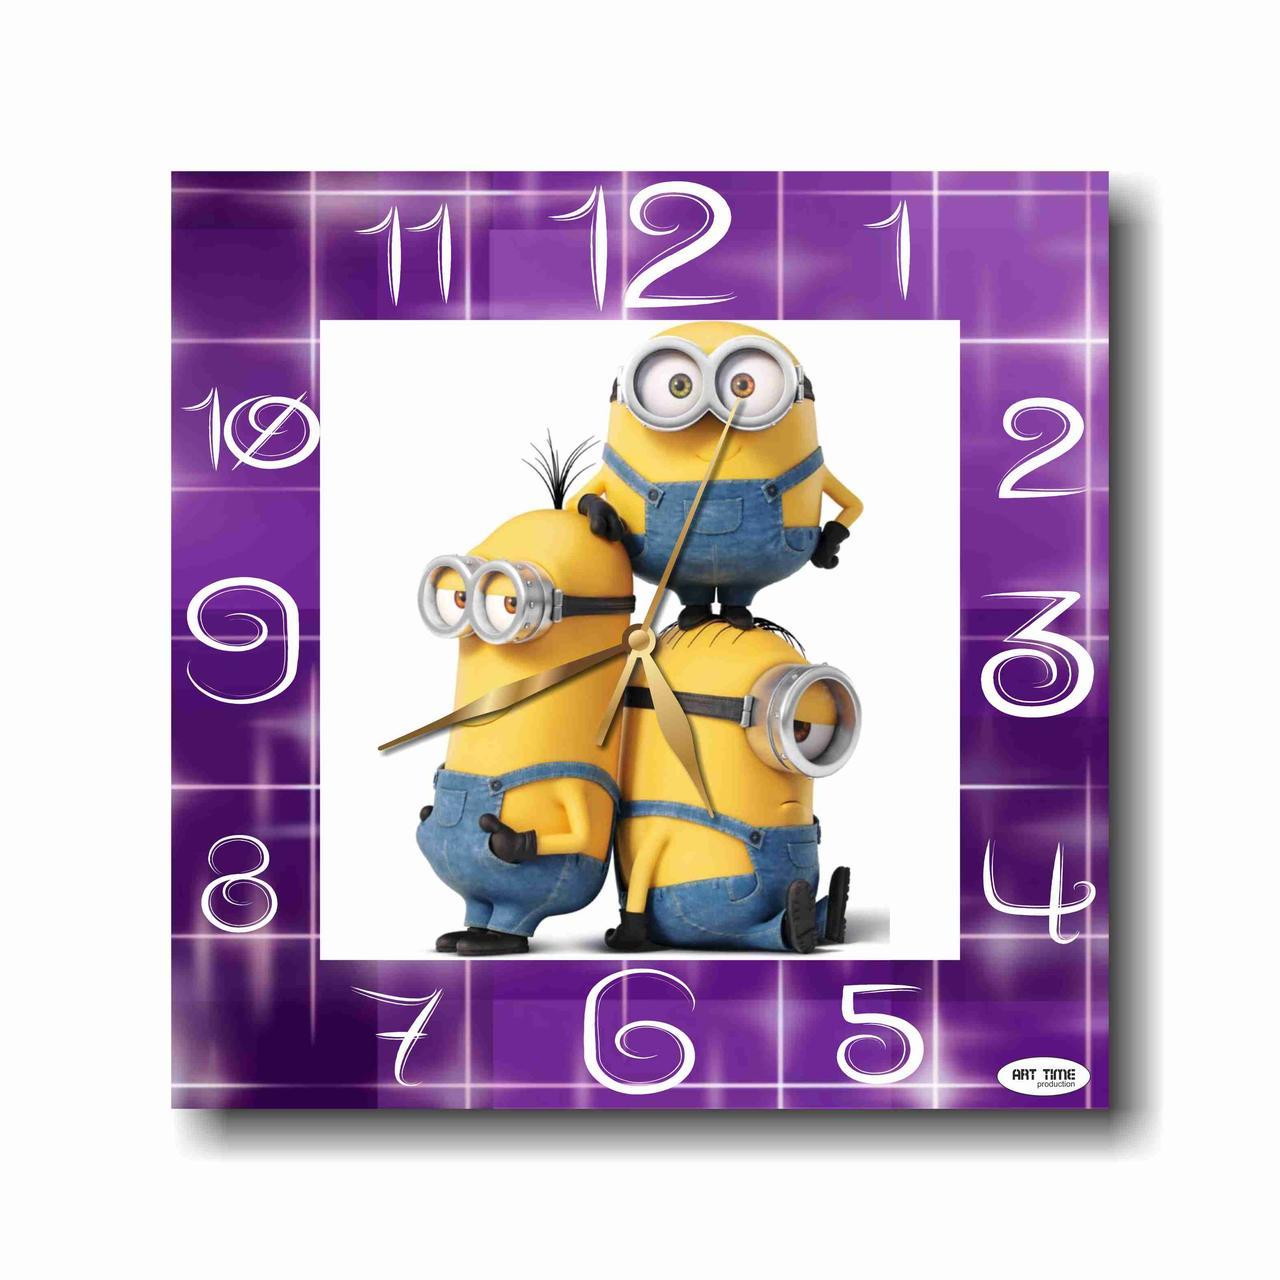 Настенные часы - Миньоны   настінний годинник - Посіпаки   Minions wall  clock dedce6be04ea2